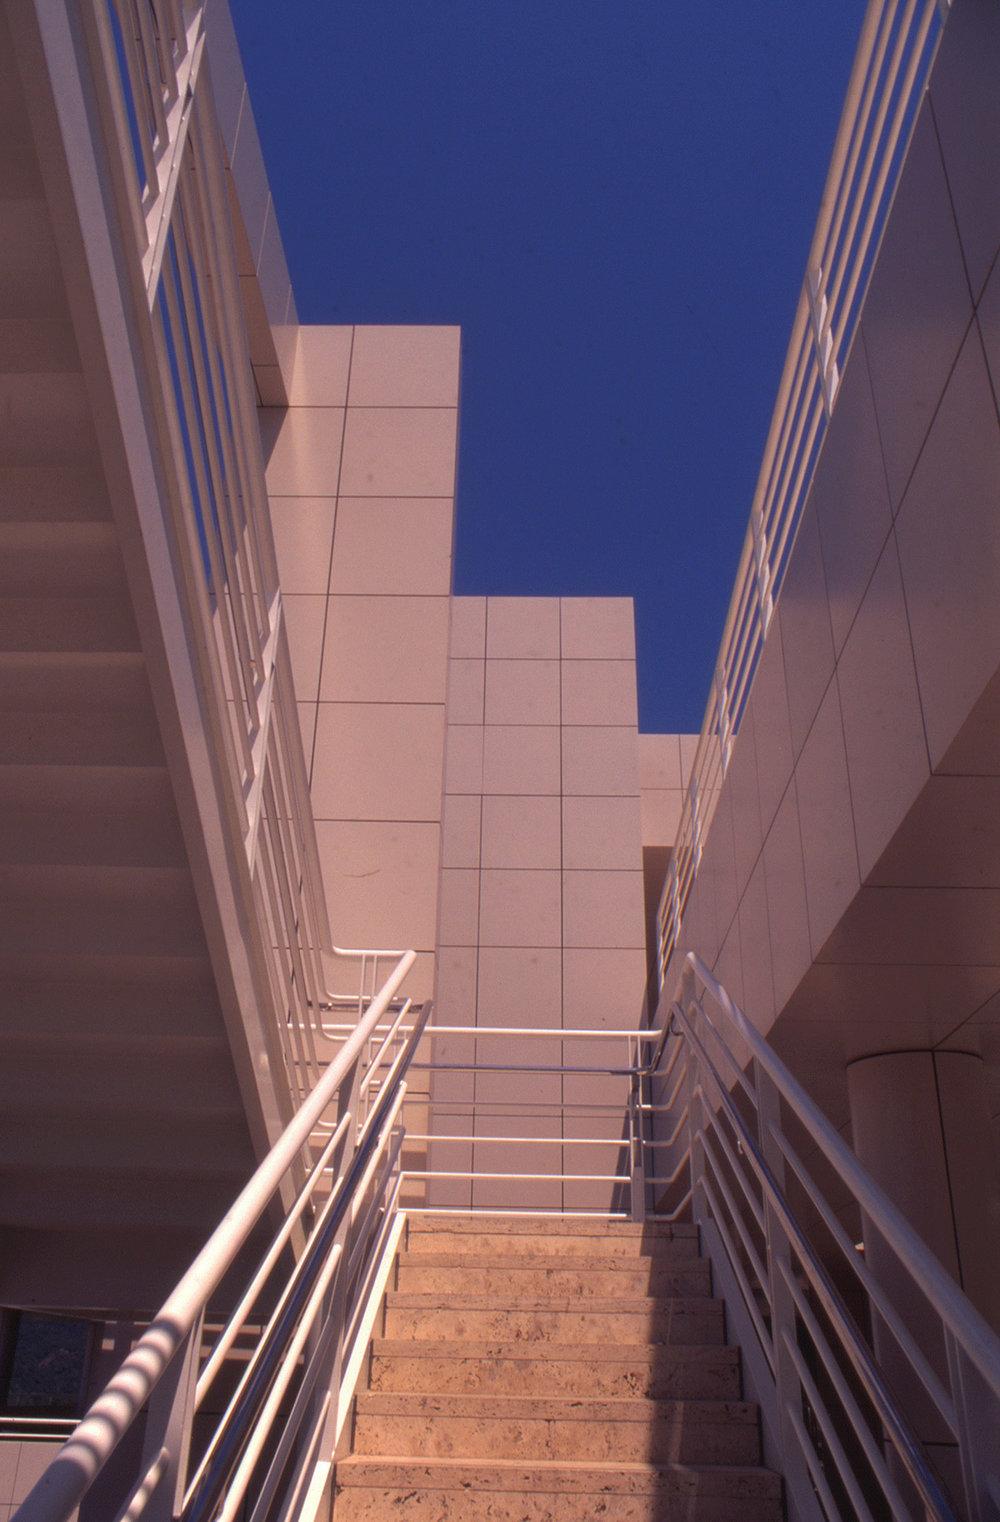 ss-oth-getty_steps-blue.jpg